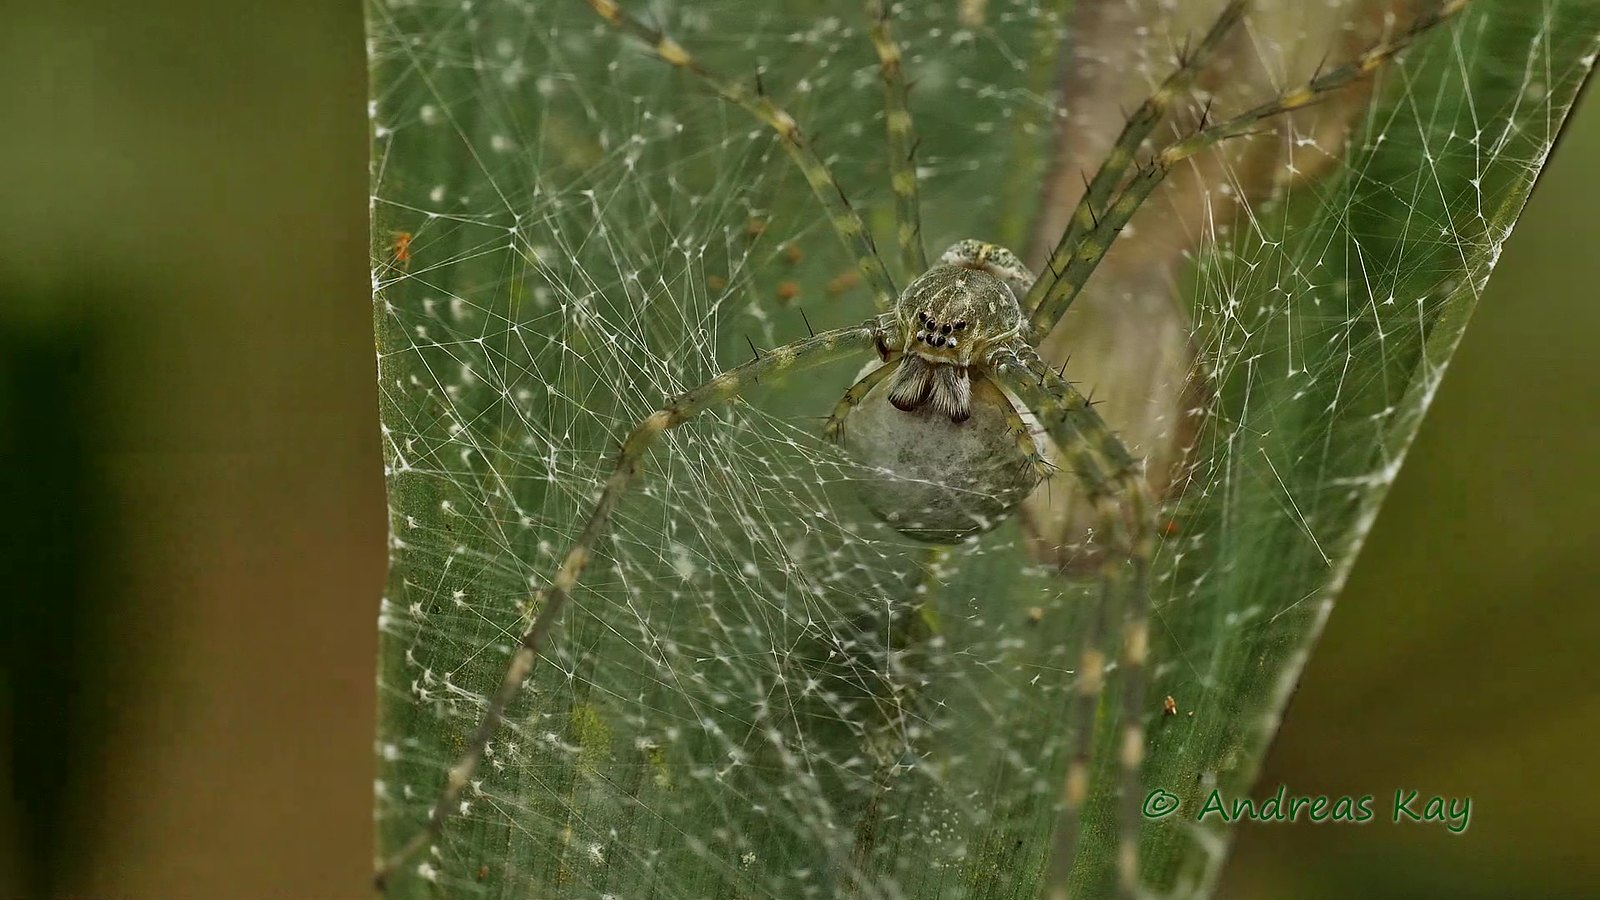 Nursery web spider, Thaumasia sp., Pisauridae